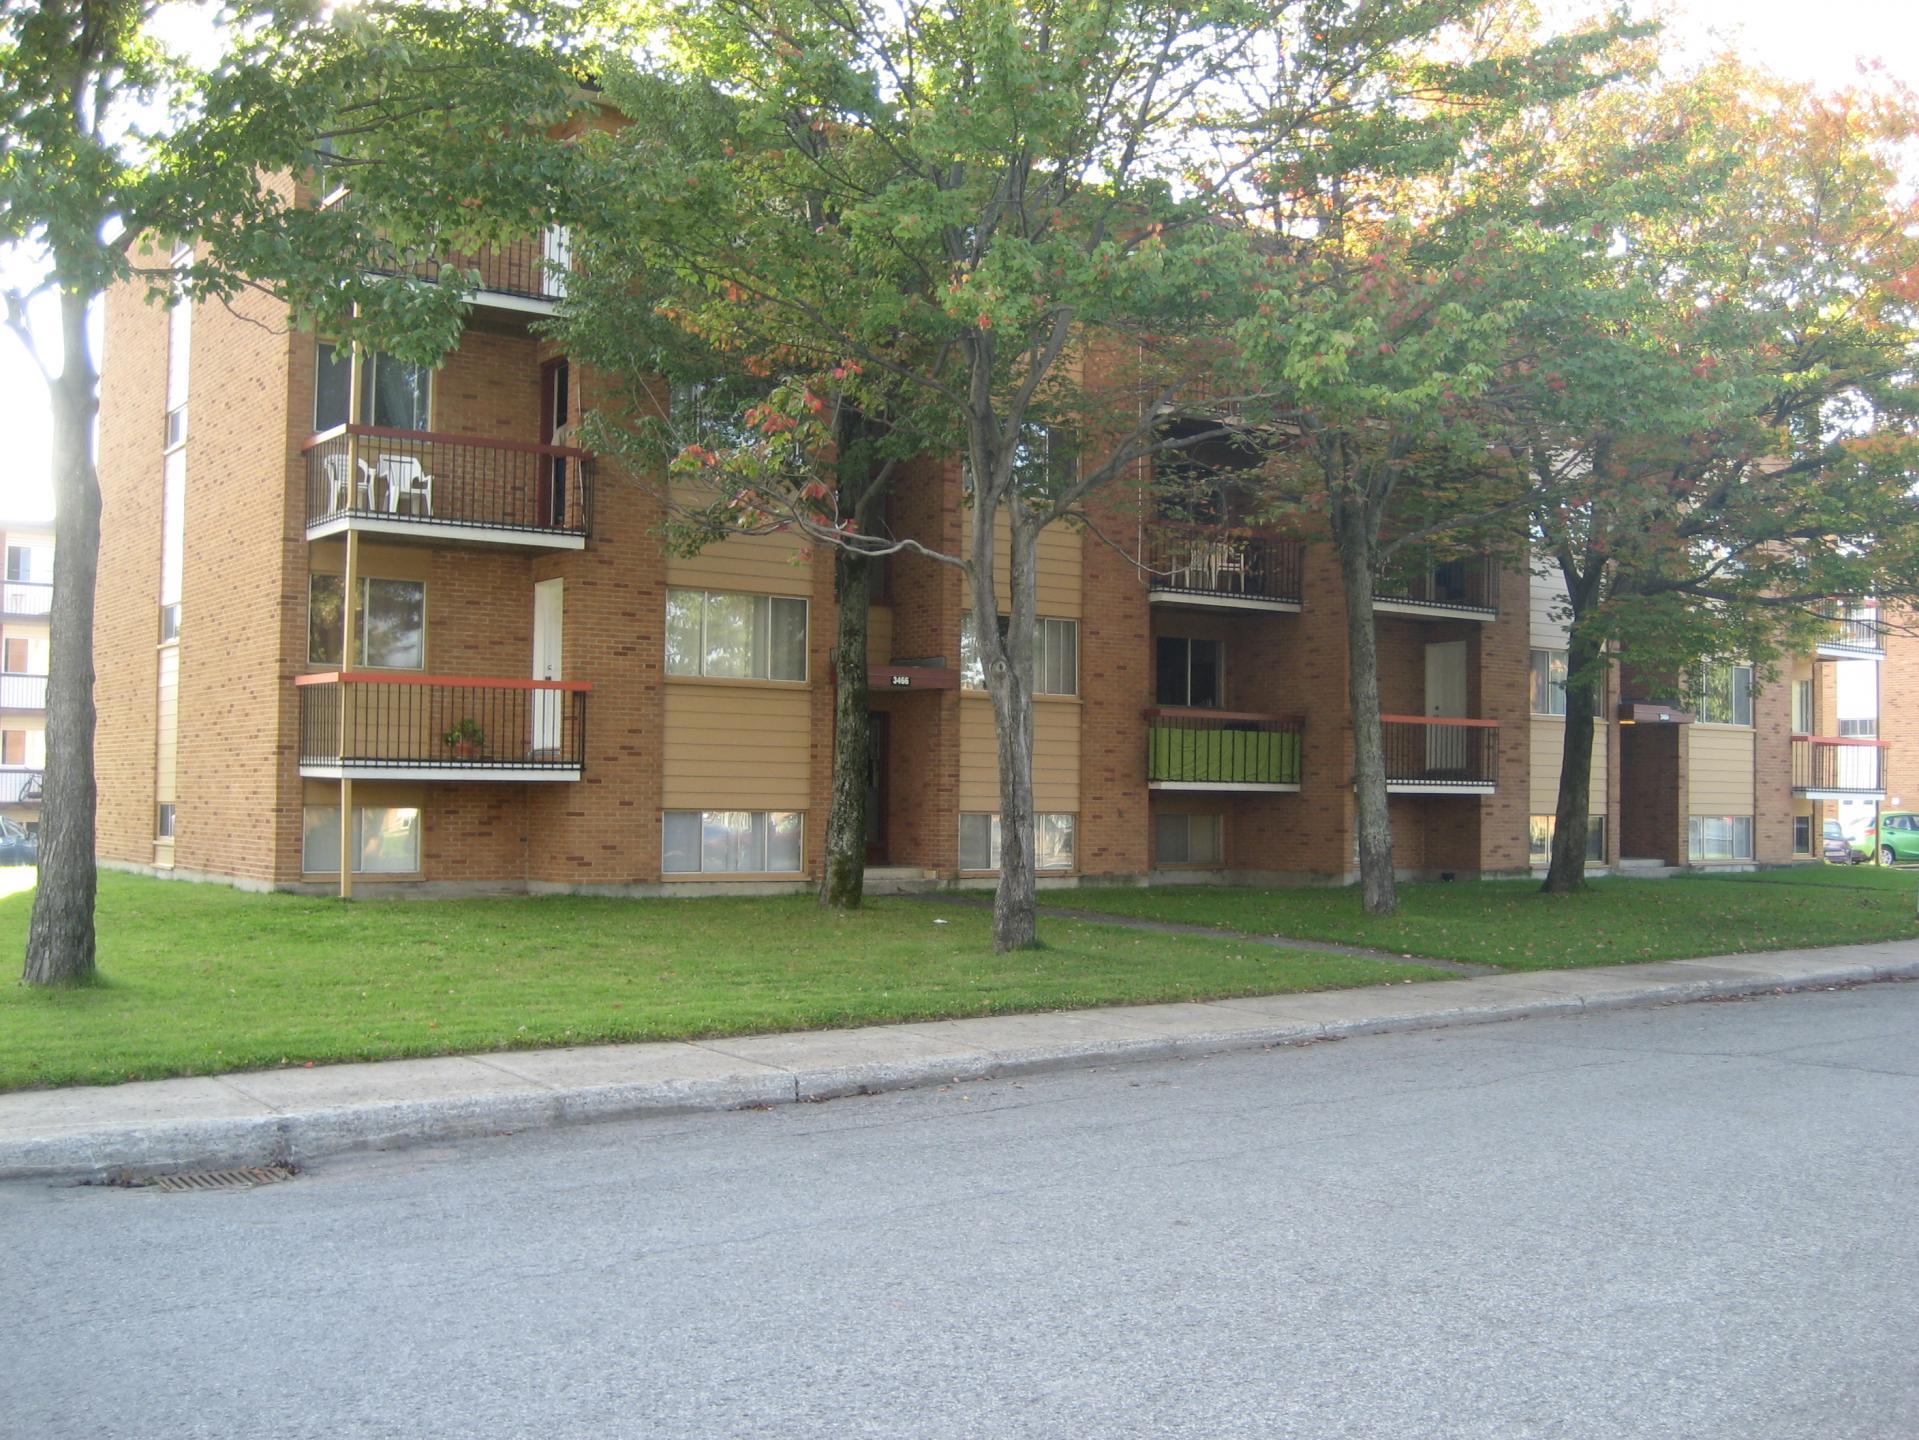 Immeubles ste foy septembre 2011 9